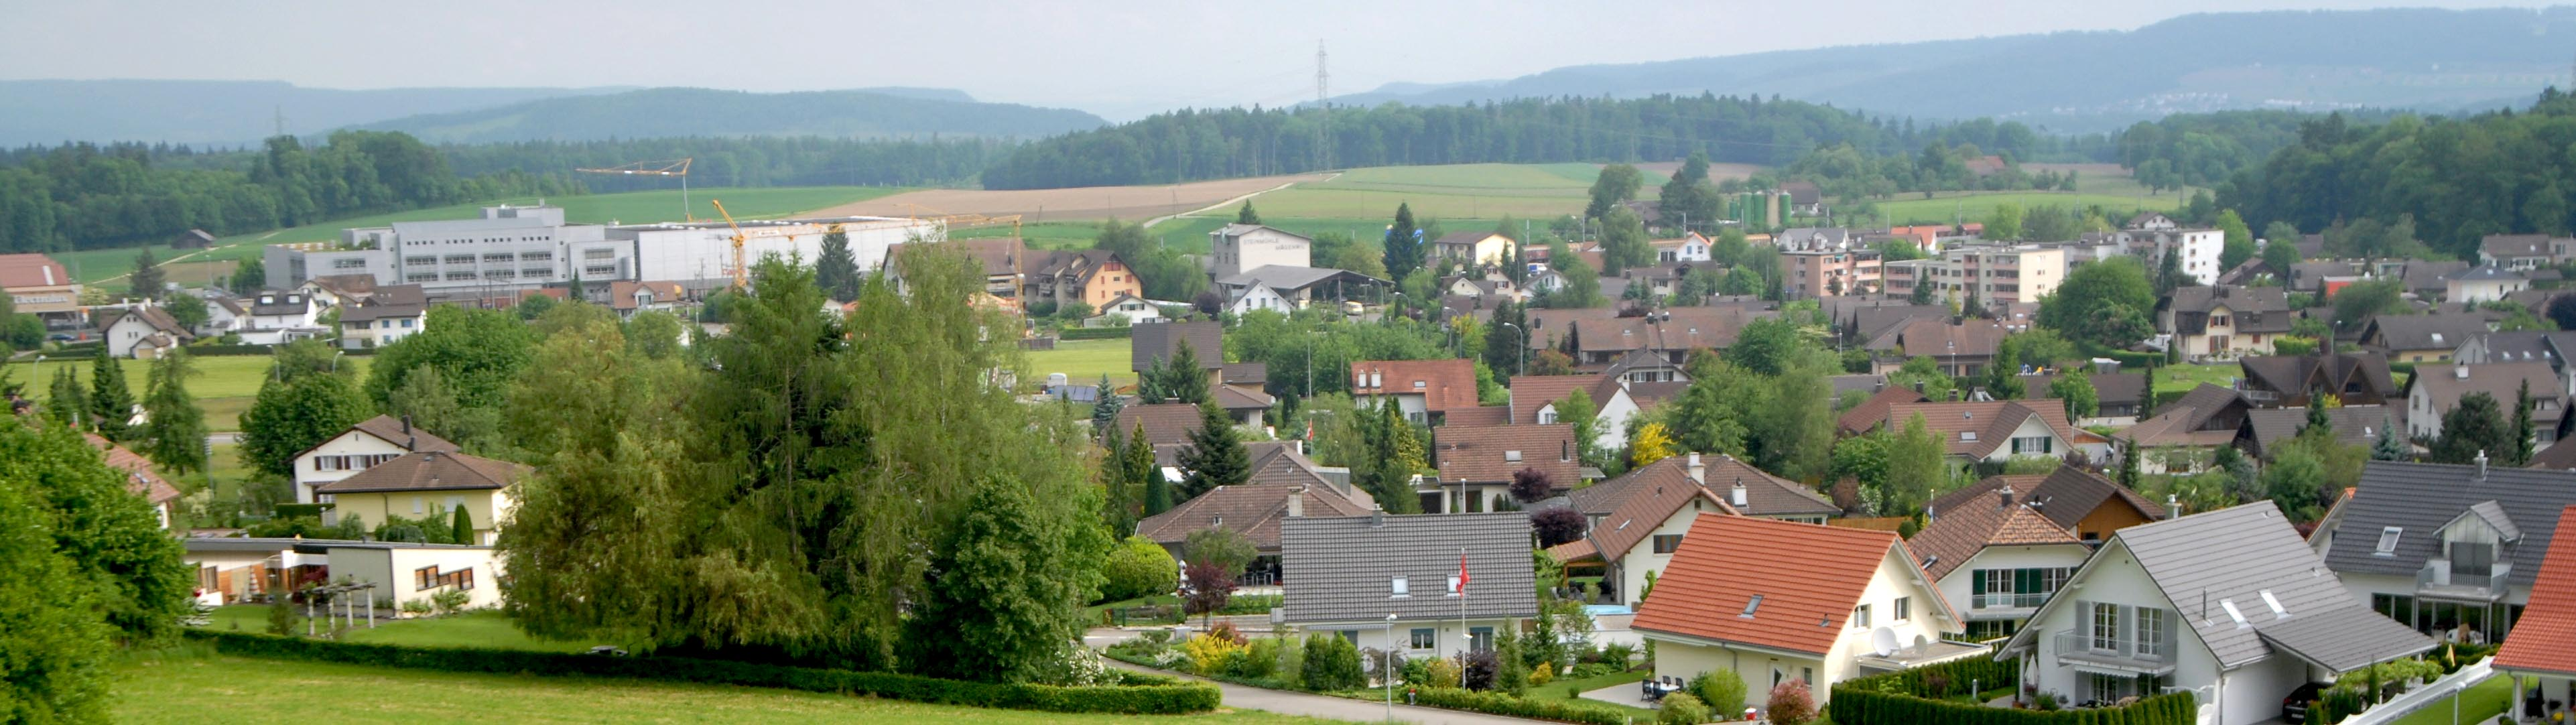 Mägenwil